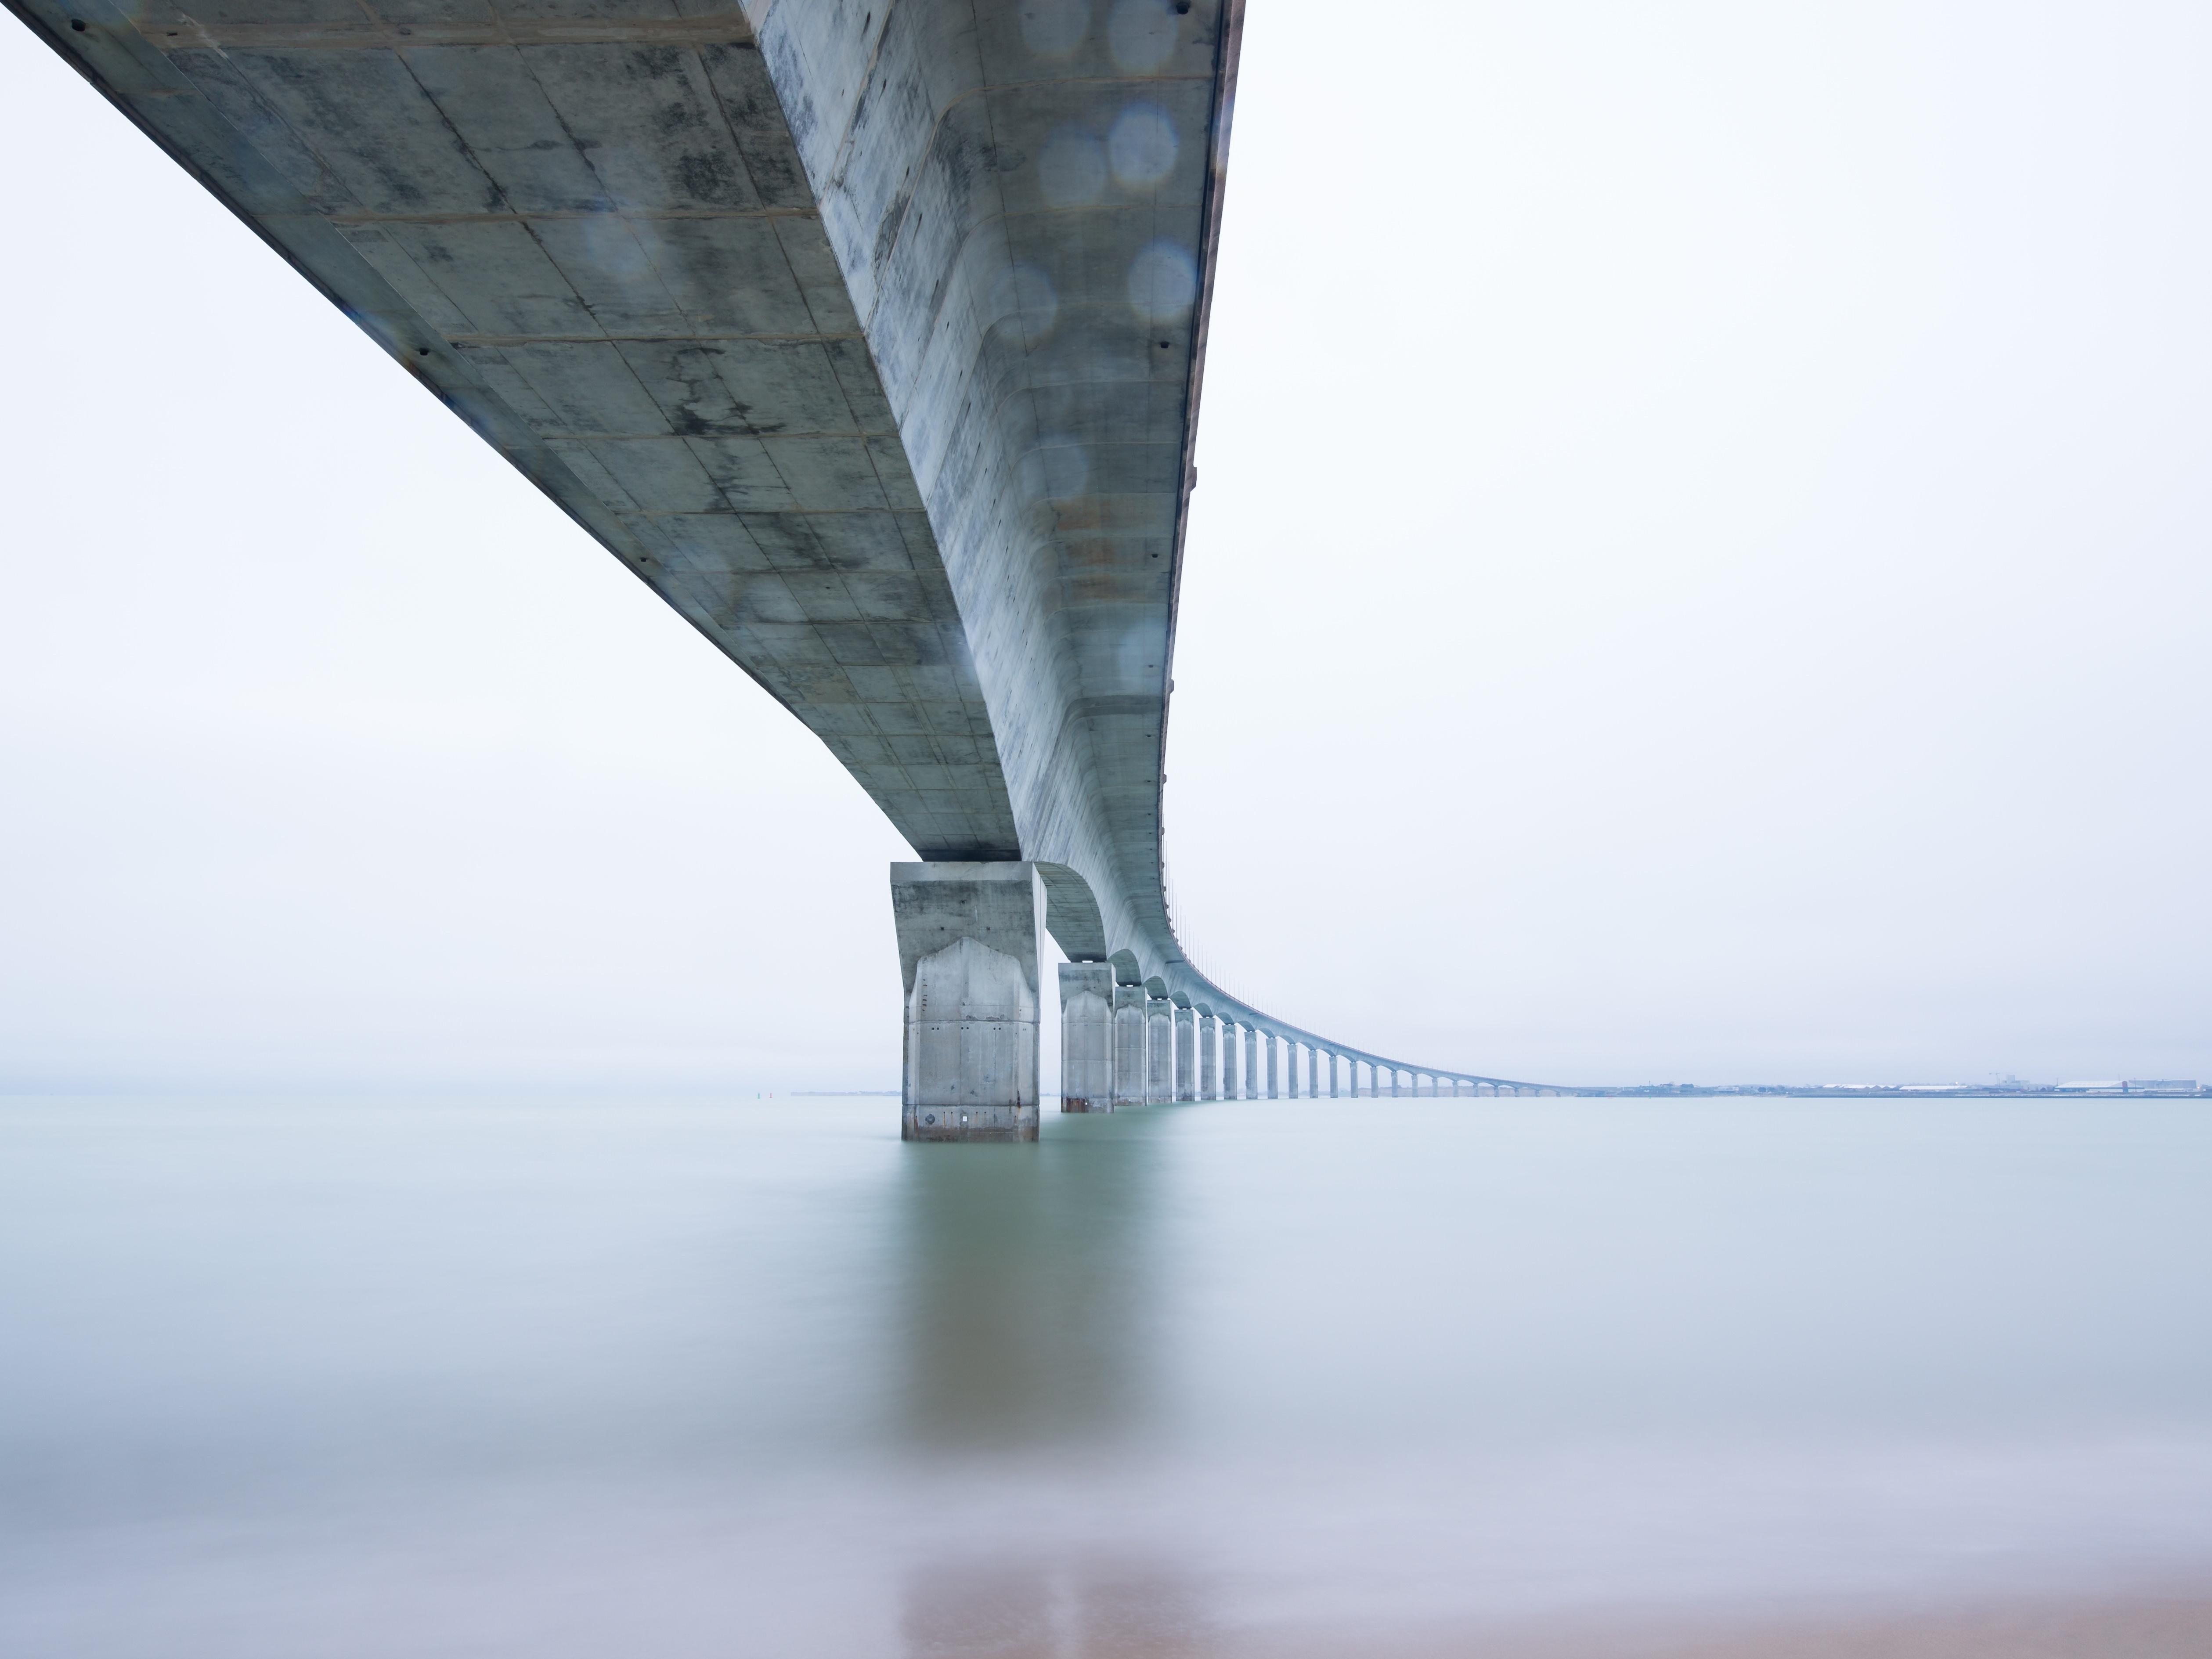 water_and_bridge.jpeg